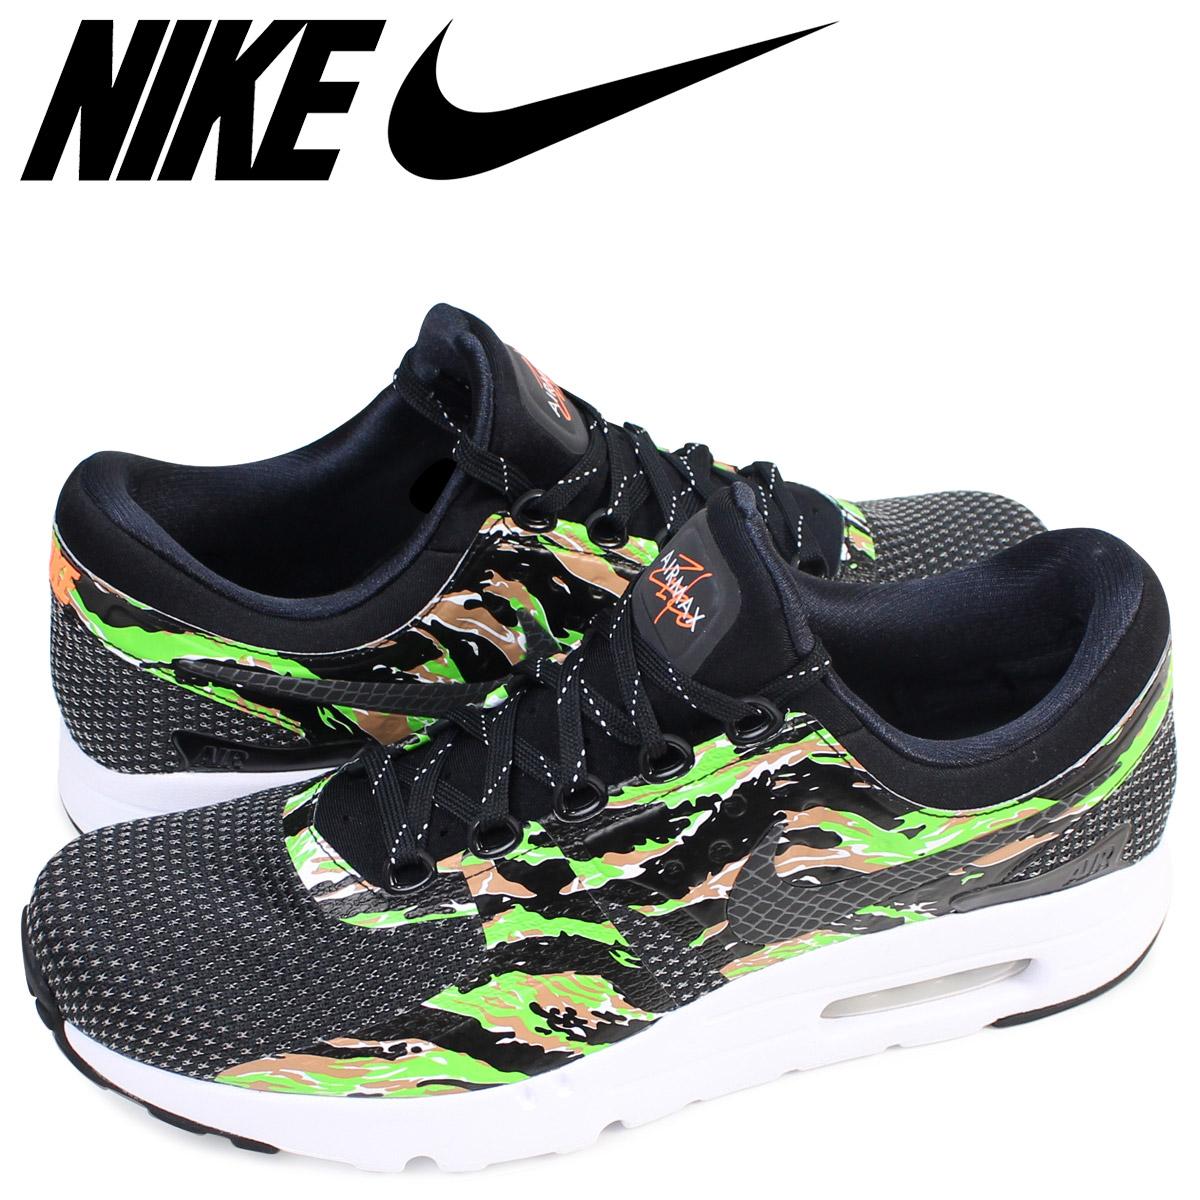 detailed look 2baf2 0aa00 Nike NIKE Air Max sneakers AIR MAX ZERO ID ATMOS TIGER CAMO AA4630-993 men  ...